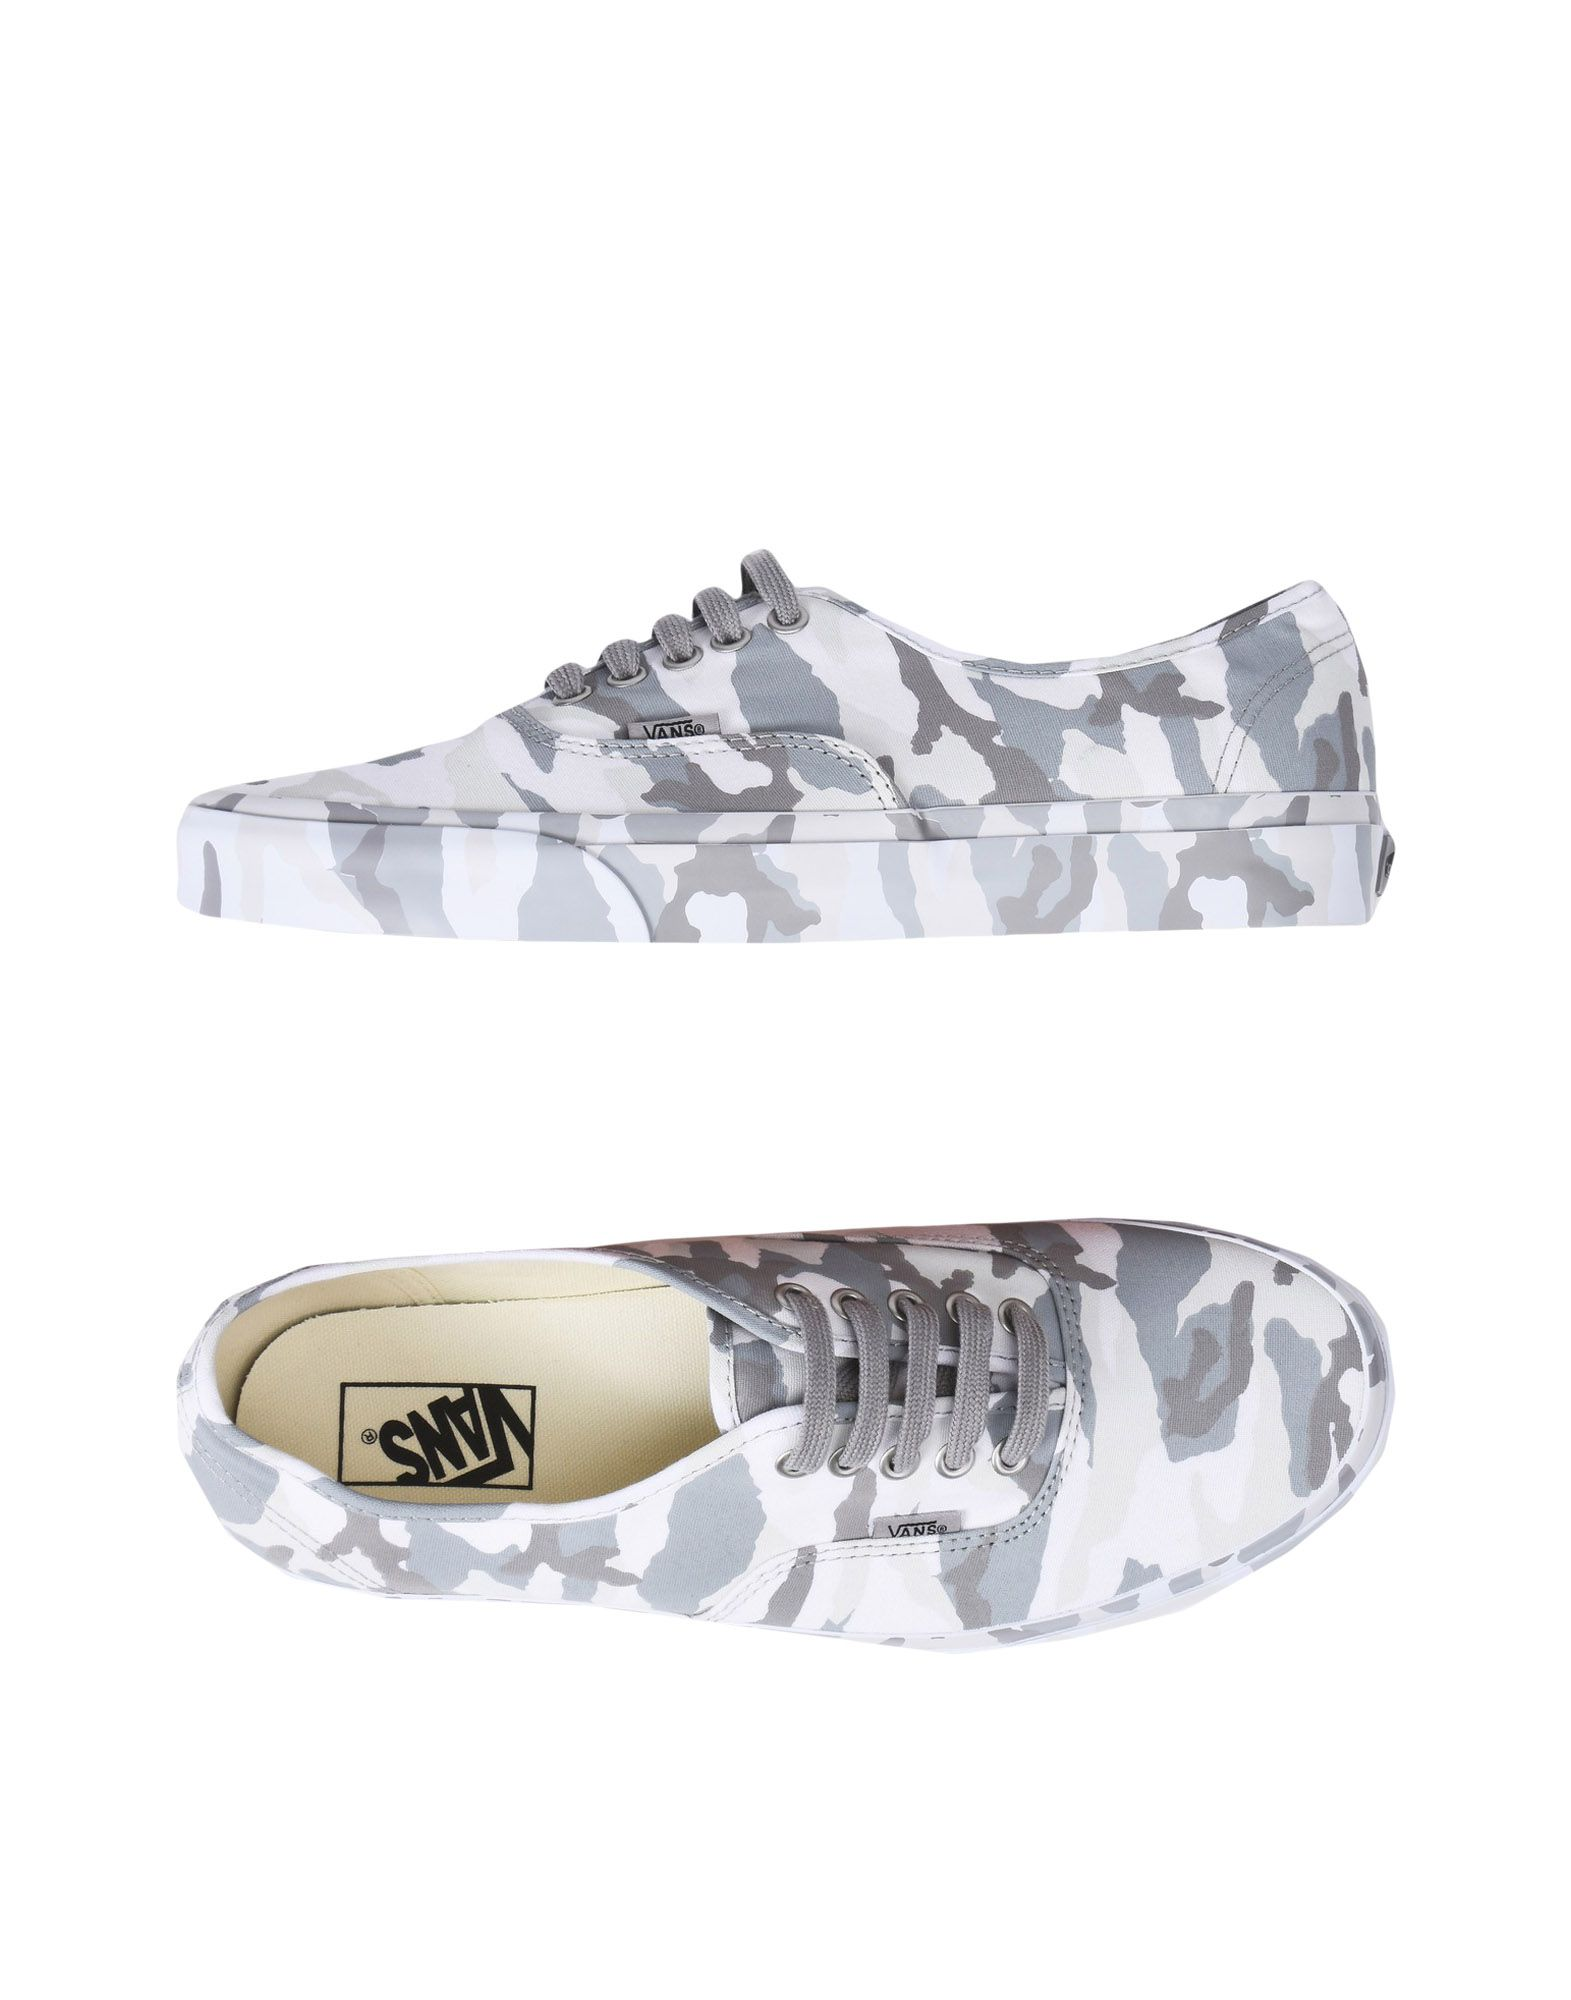 Vans Ua Authentic Authentic Authentic - Sneakers - Men Vans Sneakers online on  Australia - 11327368BO d746ae